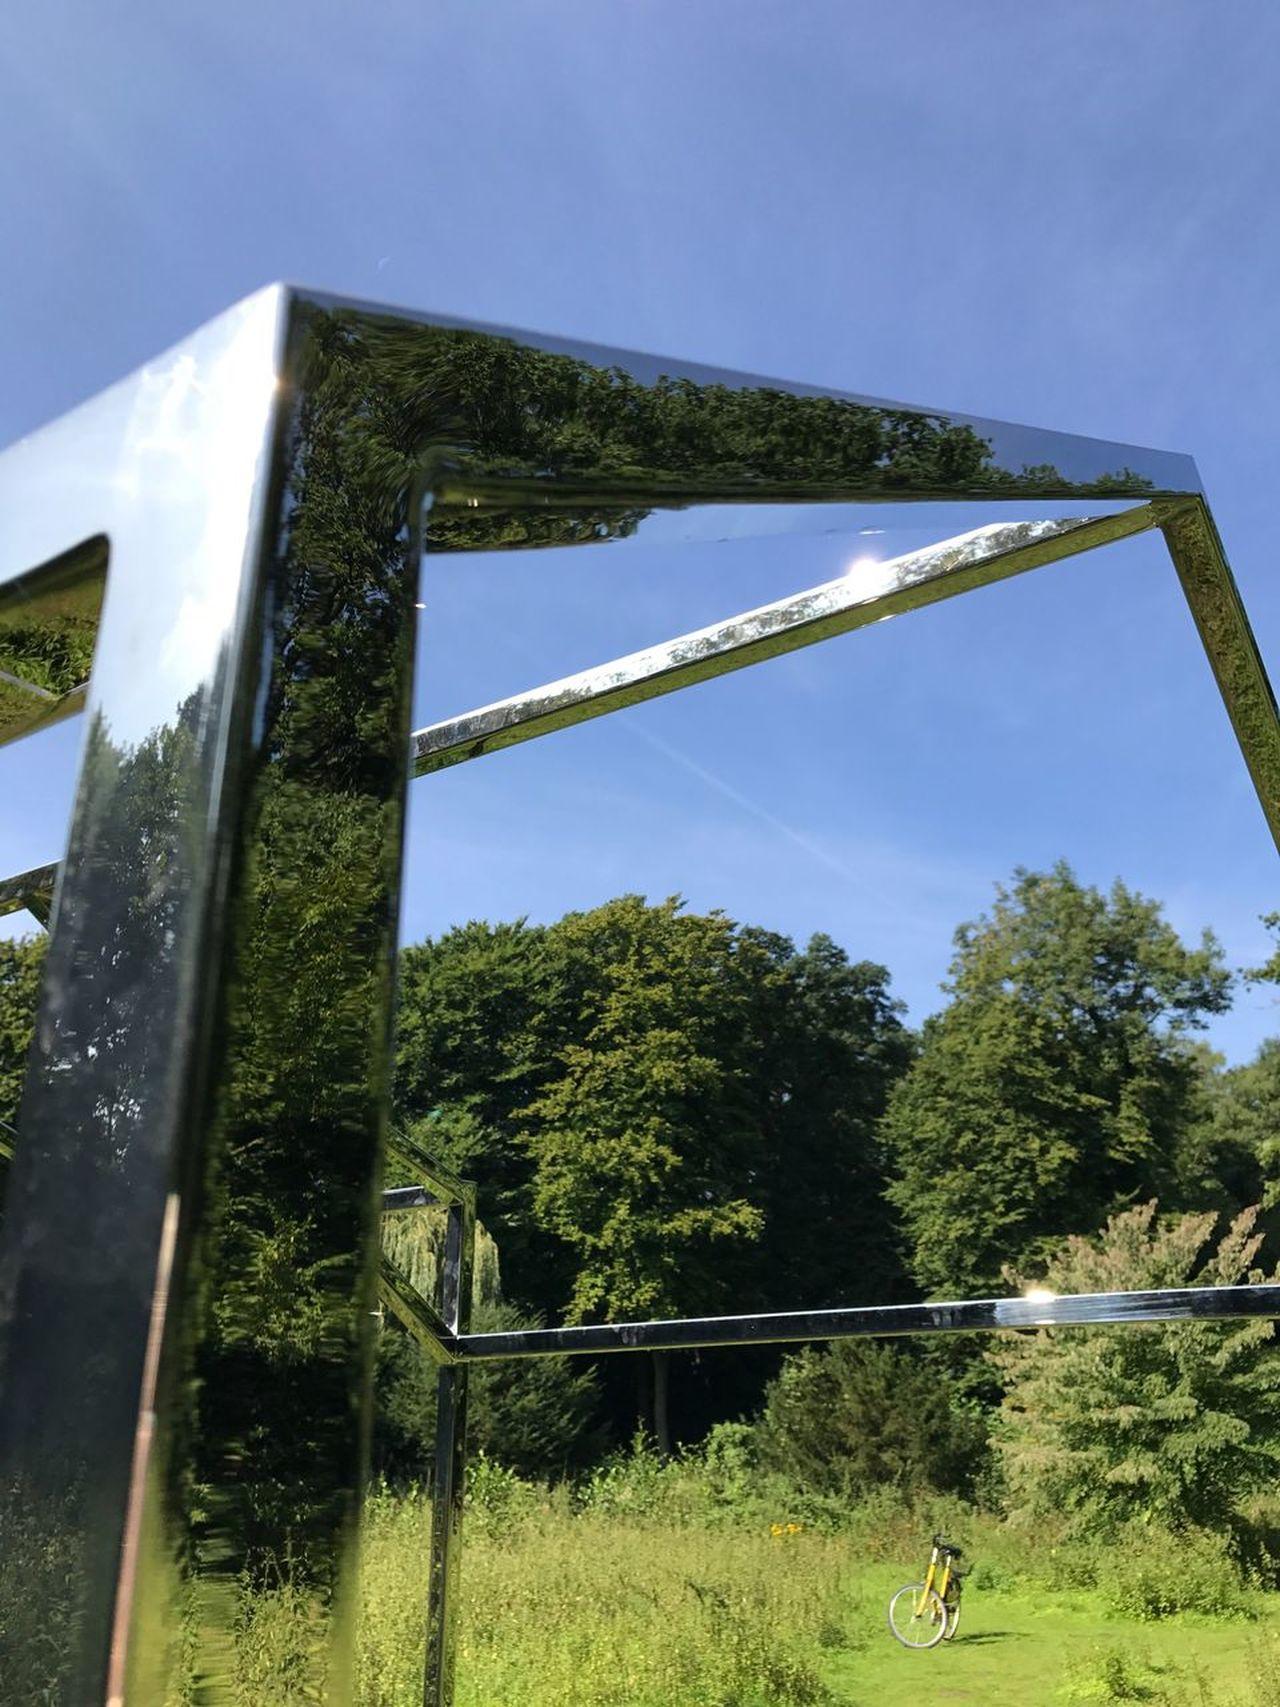 Hreinn Friðfinnsson Skulpturen Projekte 17 Tree Grass Day Outdoors One Person Real People Nature Growth Sky Animal Themes People